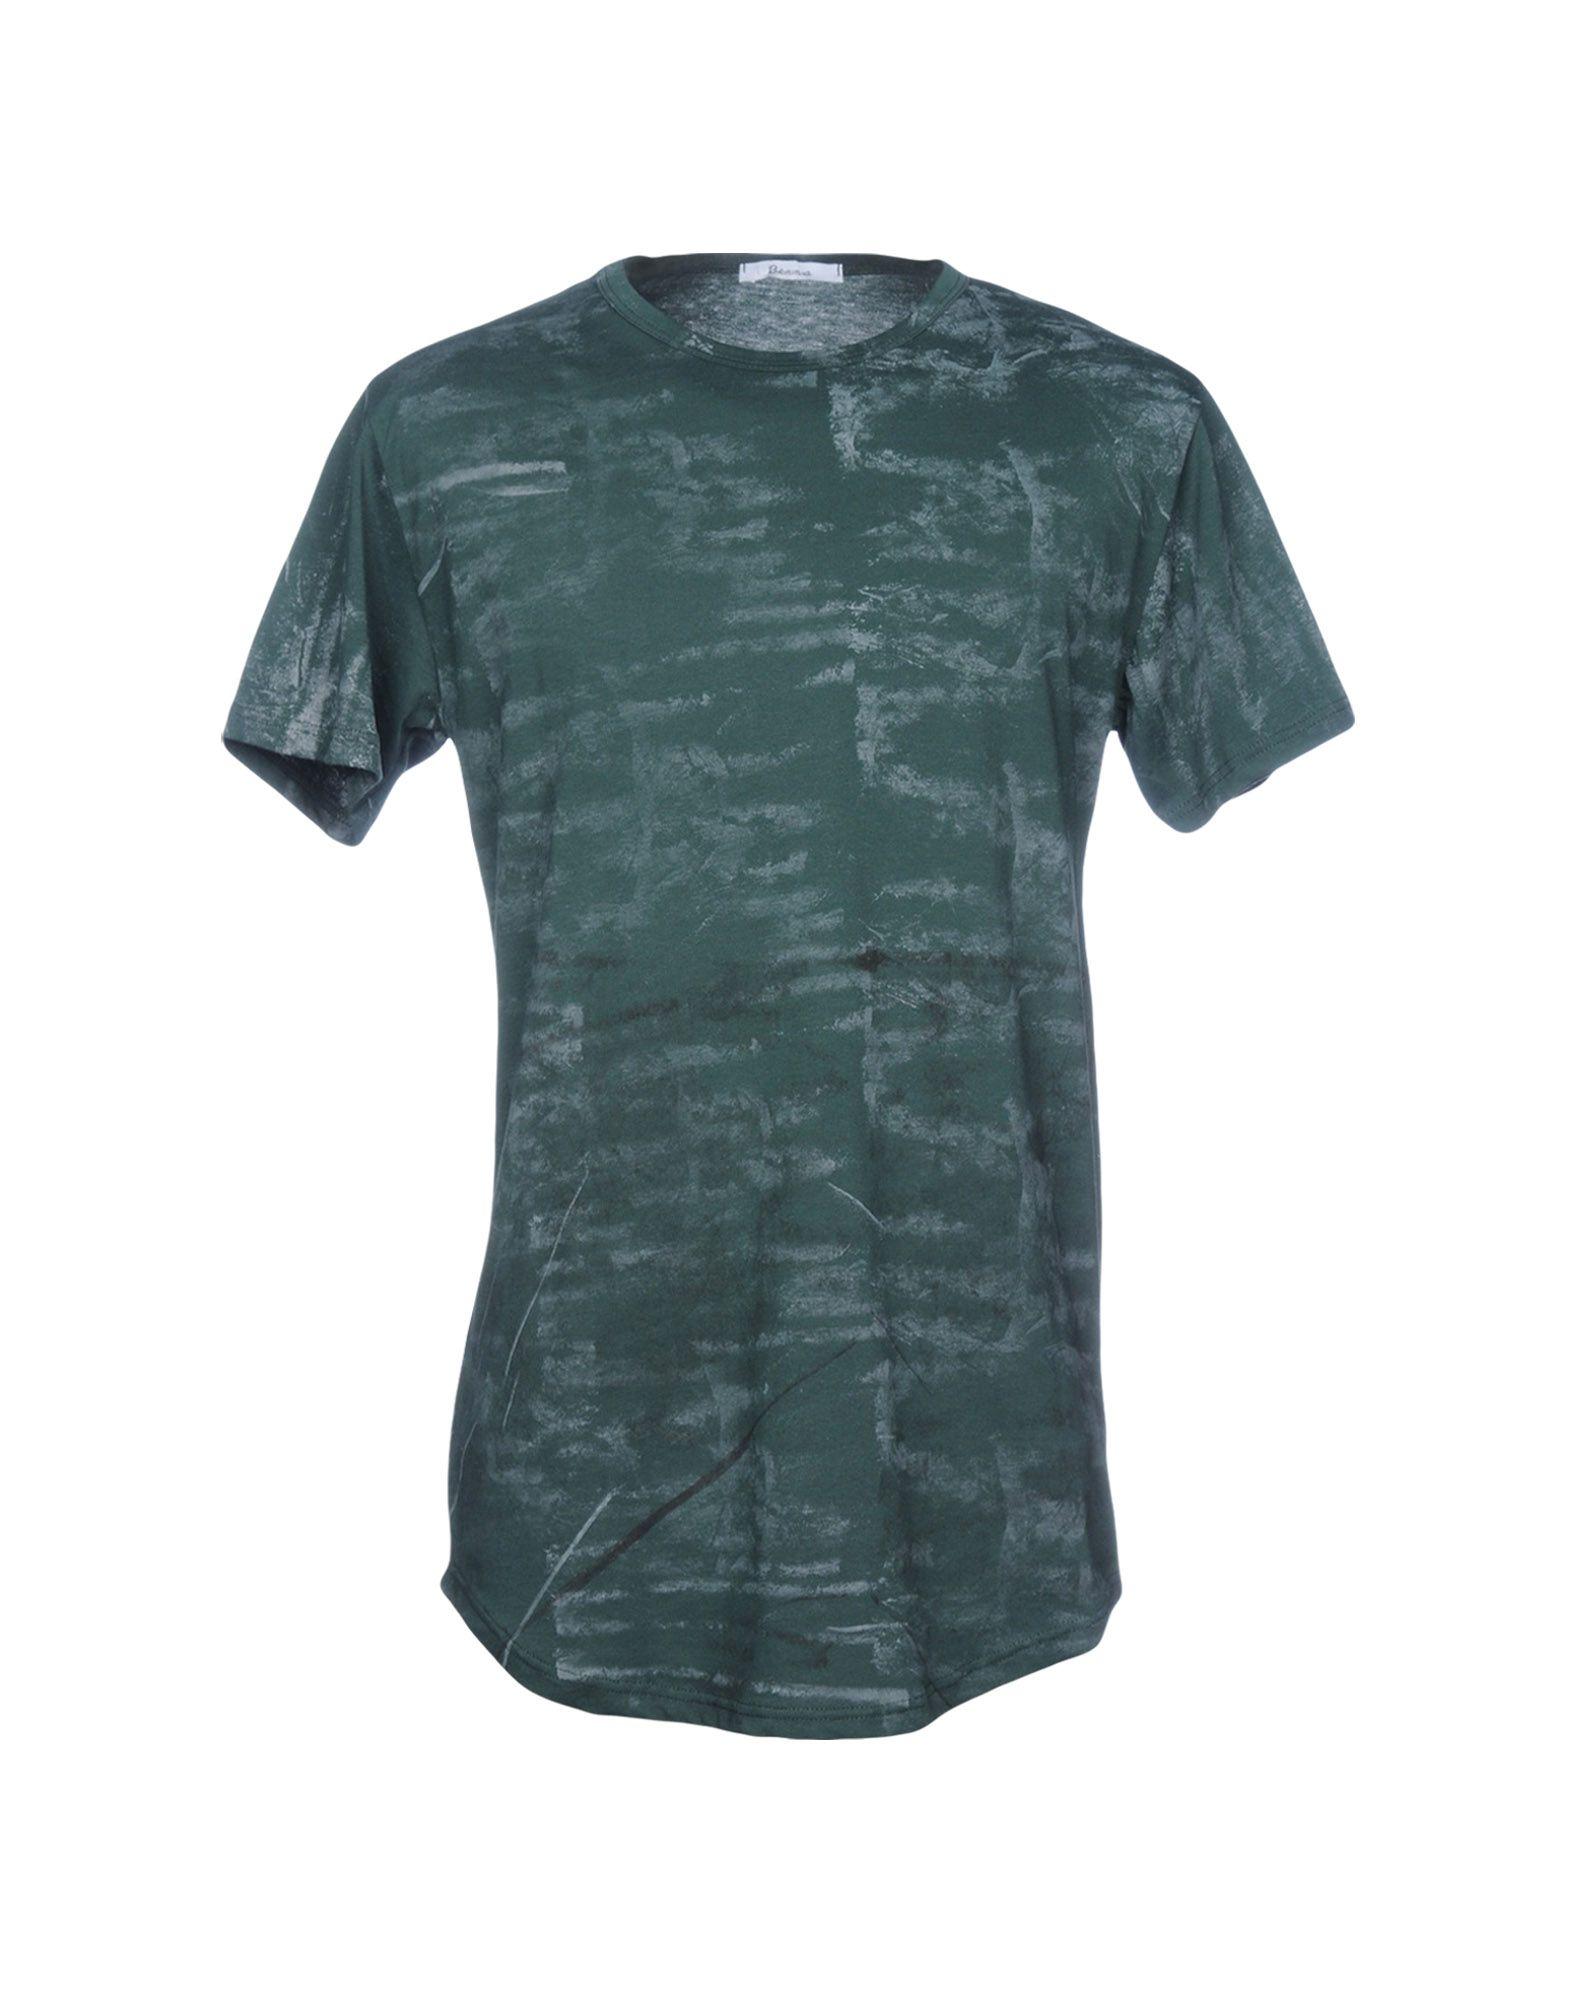 A buon mercato mercato buon A buon mercato T-Shirt Berna Uomo - 12195902MM 5f3c8f